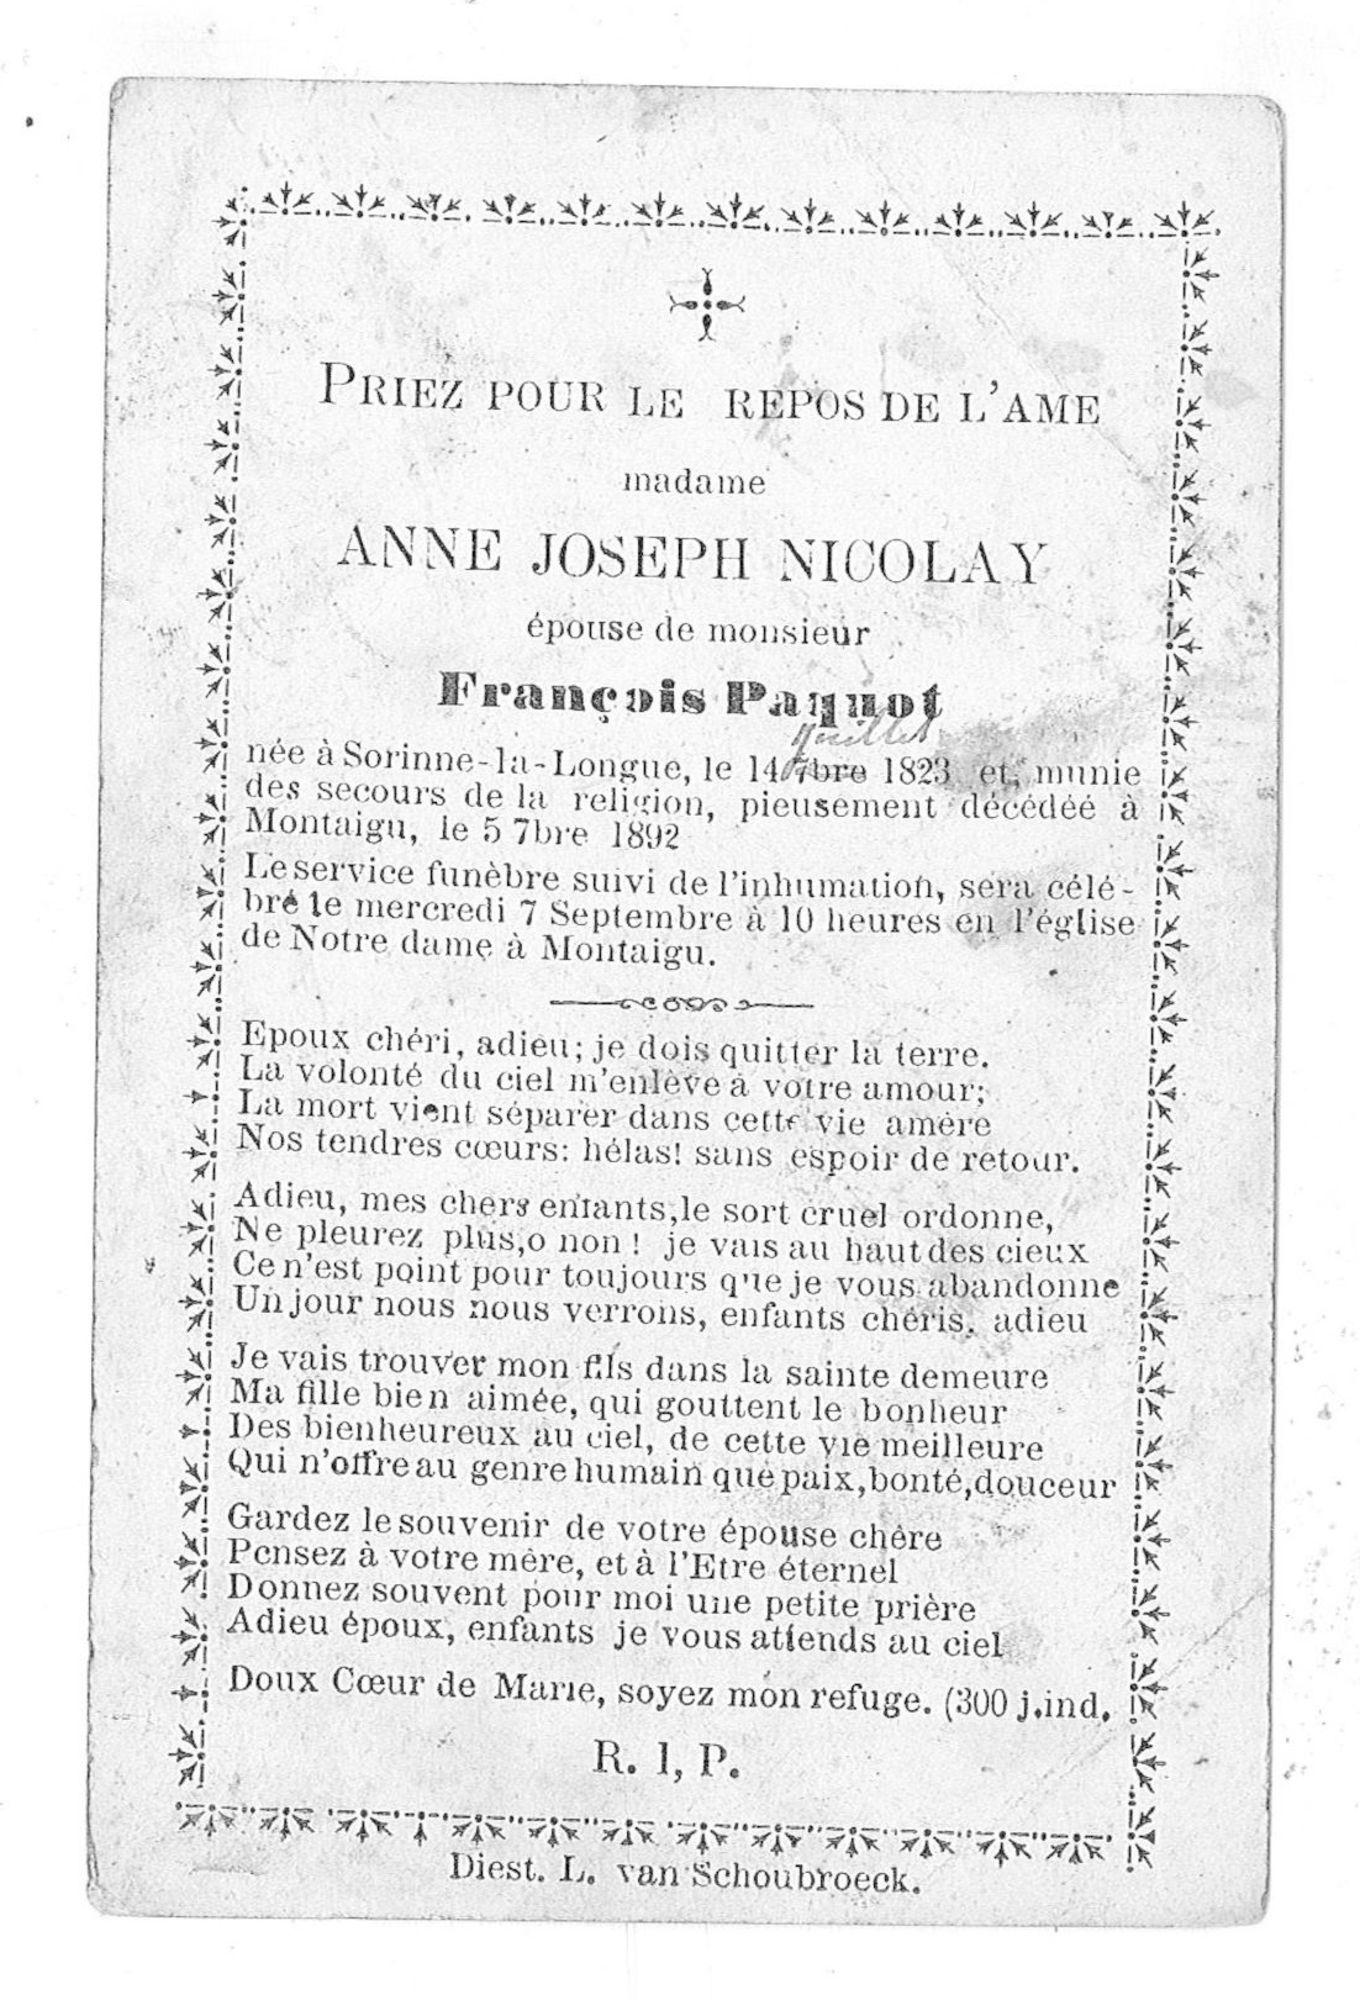 Anne-Joseph Nicolay